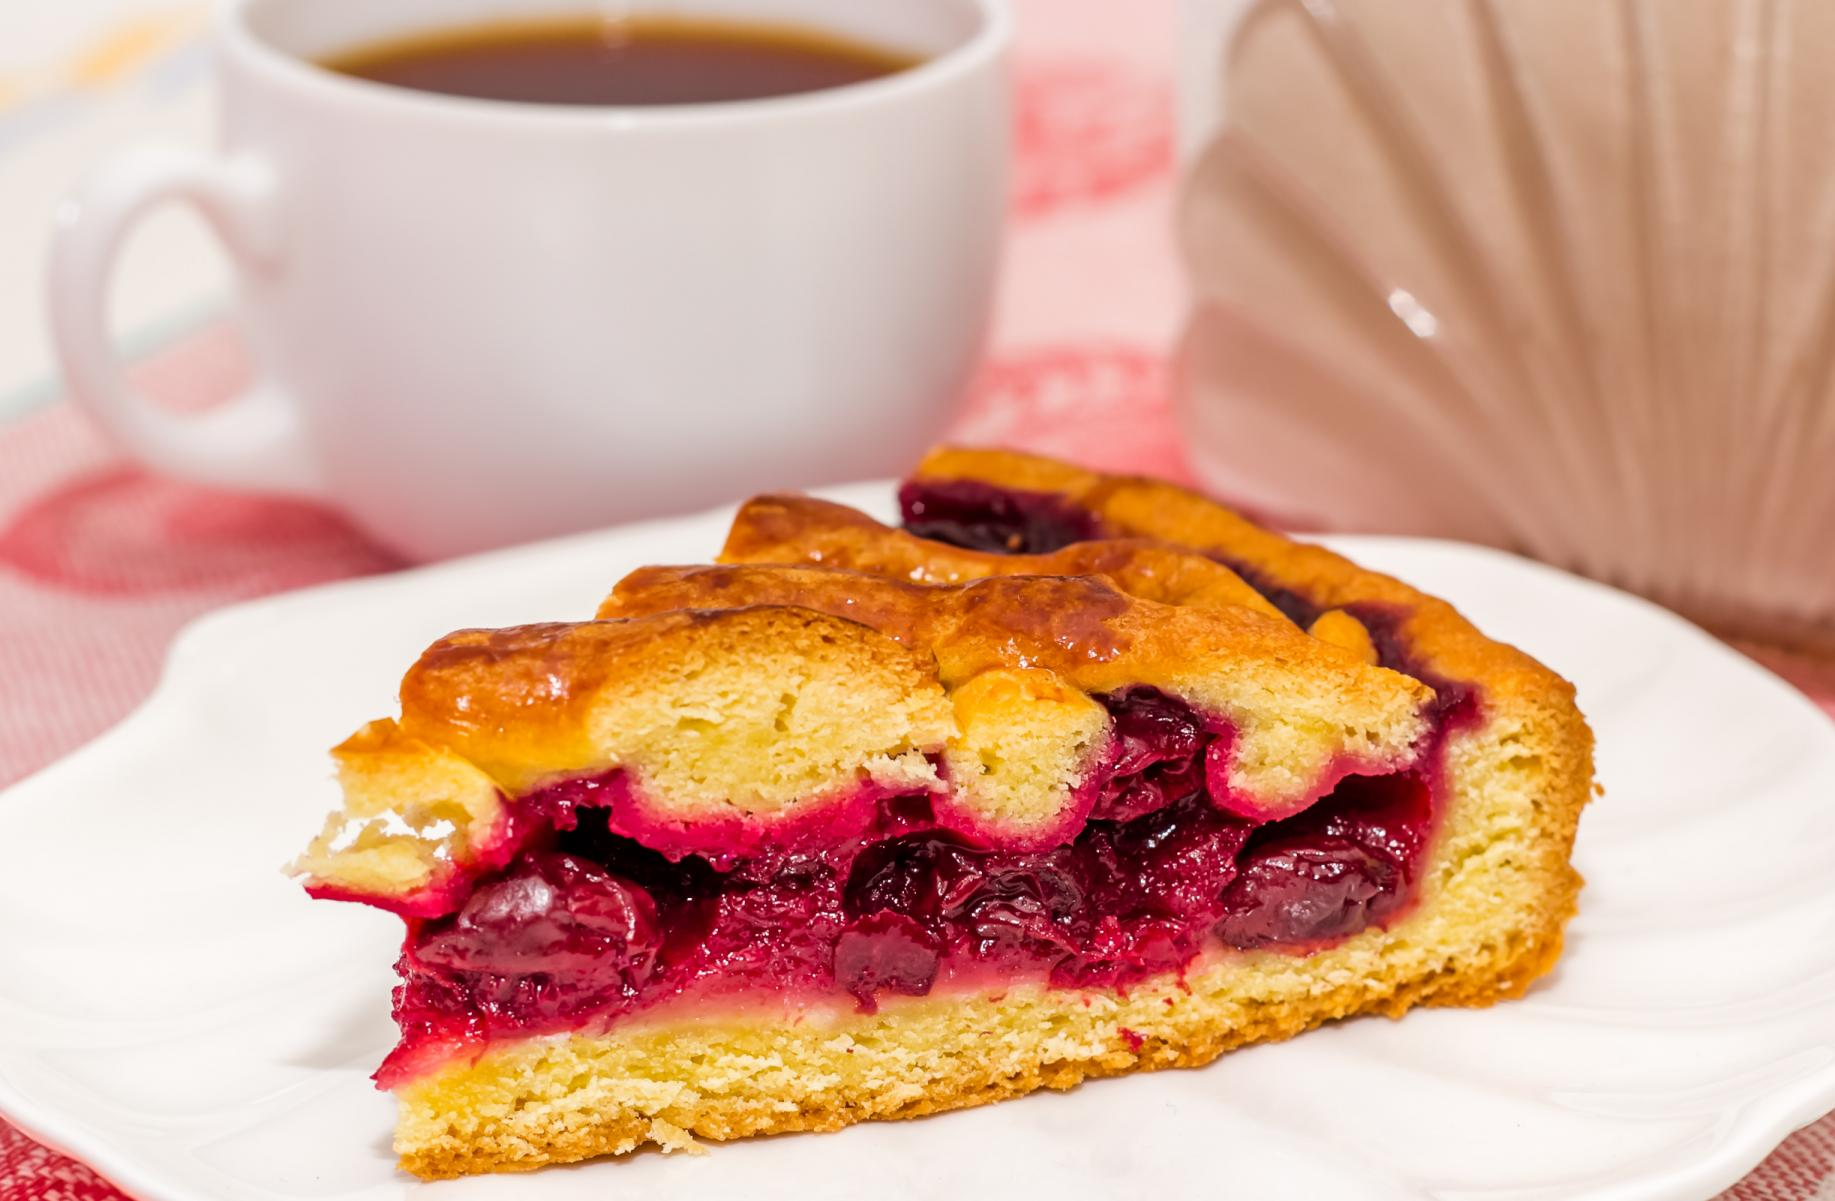 вишнёвый пирог из дрожжевого теста рецепт с фото